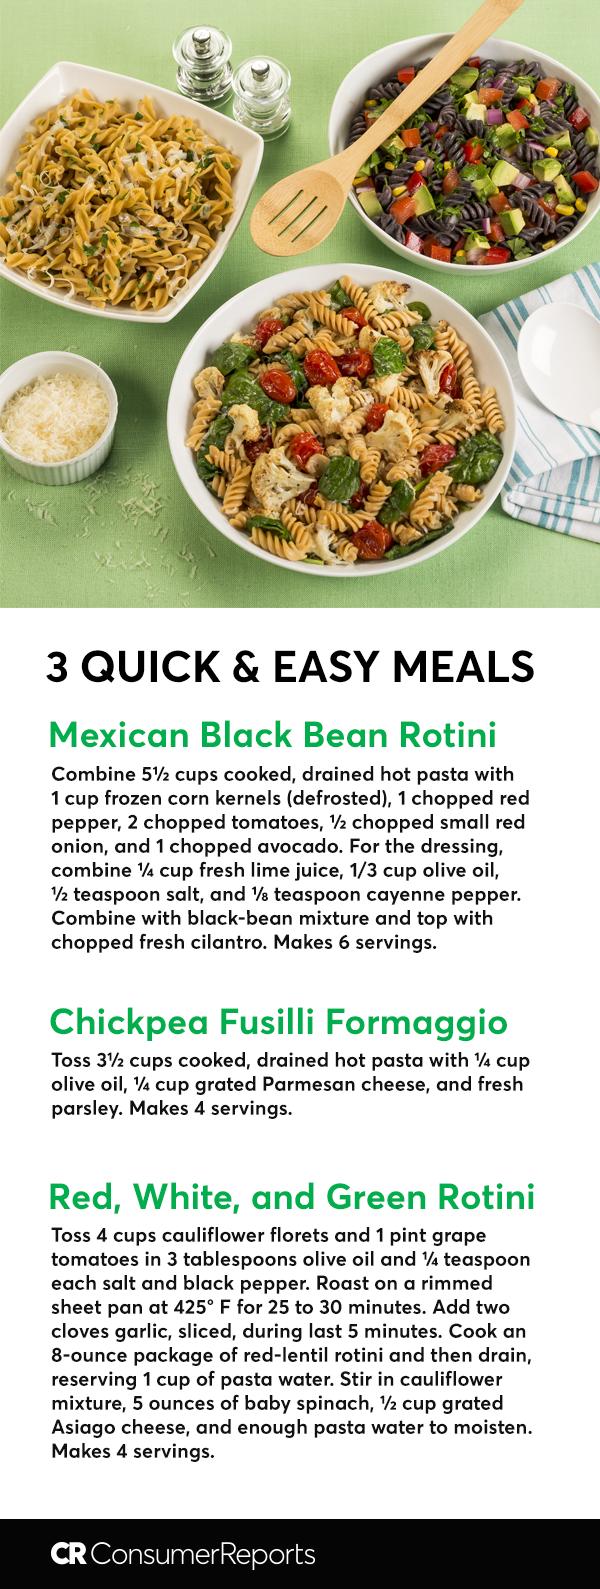 Tastiest Ways to Top Legume Pastas | Consumer reports, Test kitchen ...